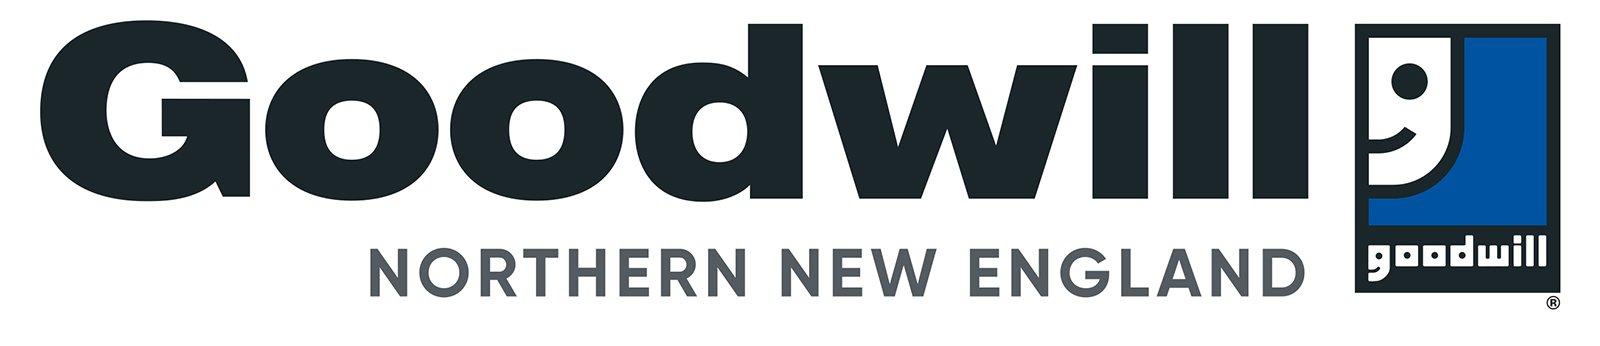 Goodwill Northern New England Logo